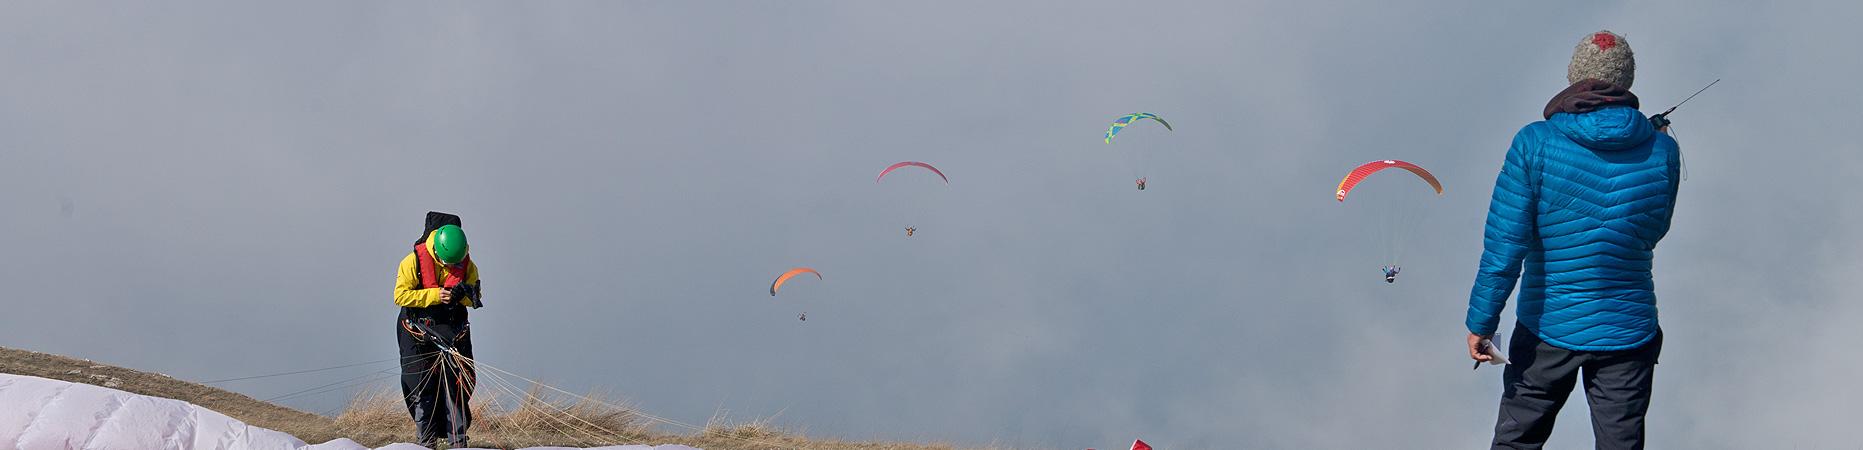 X-dream Fly Siku Startplatz